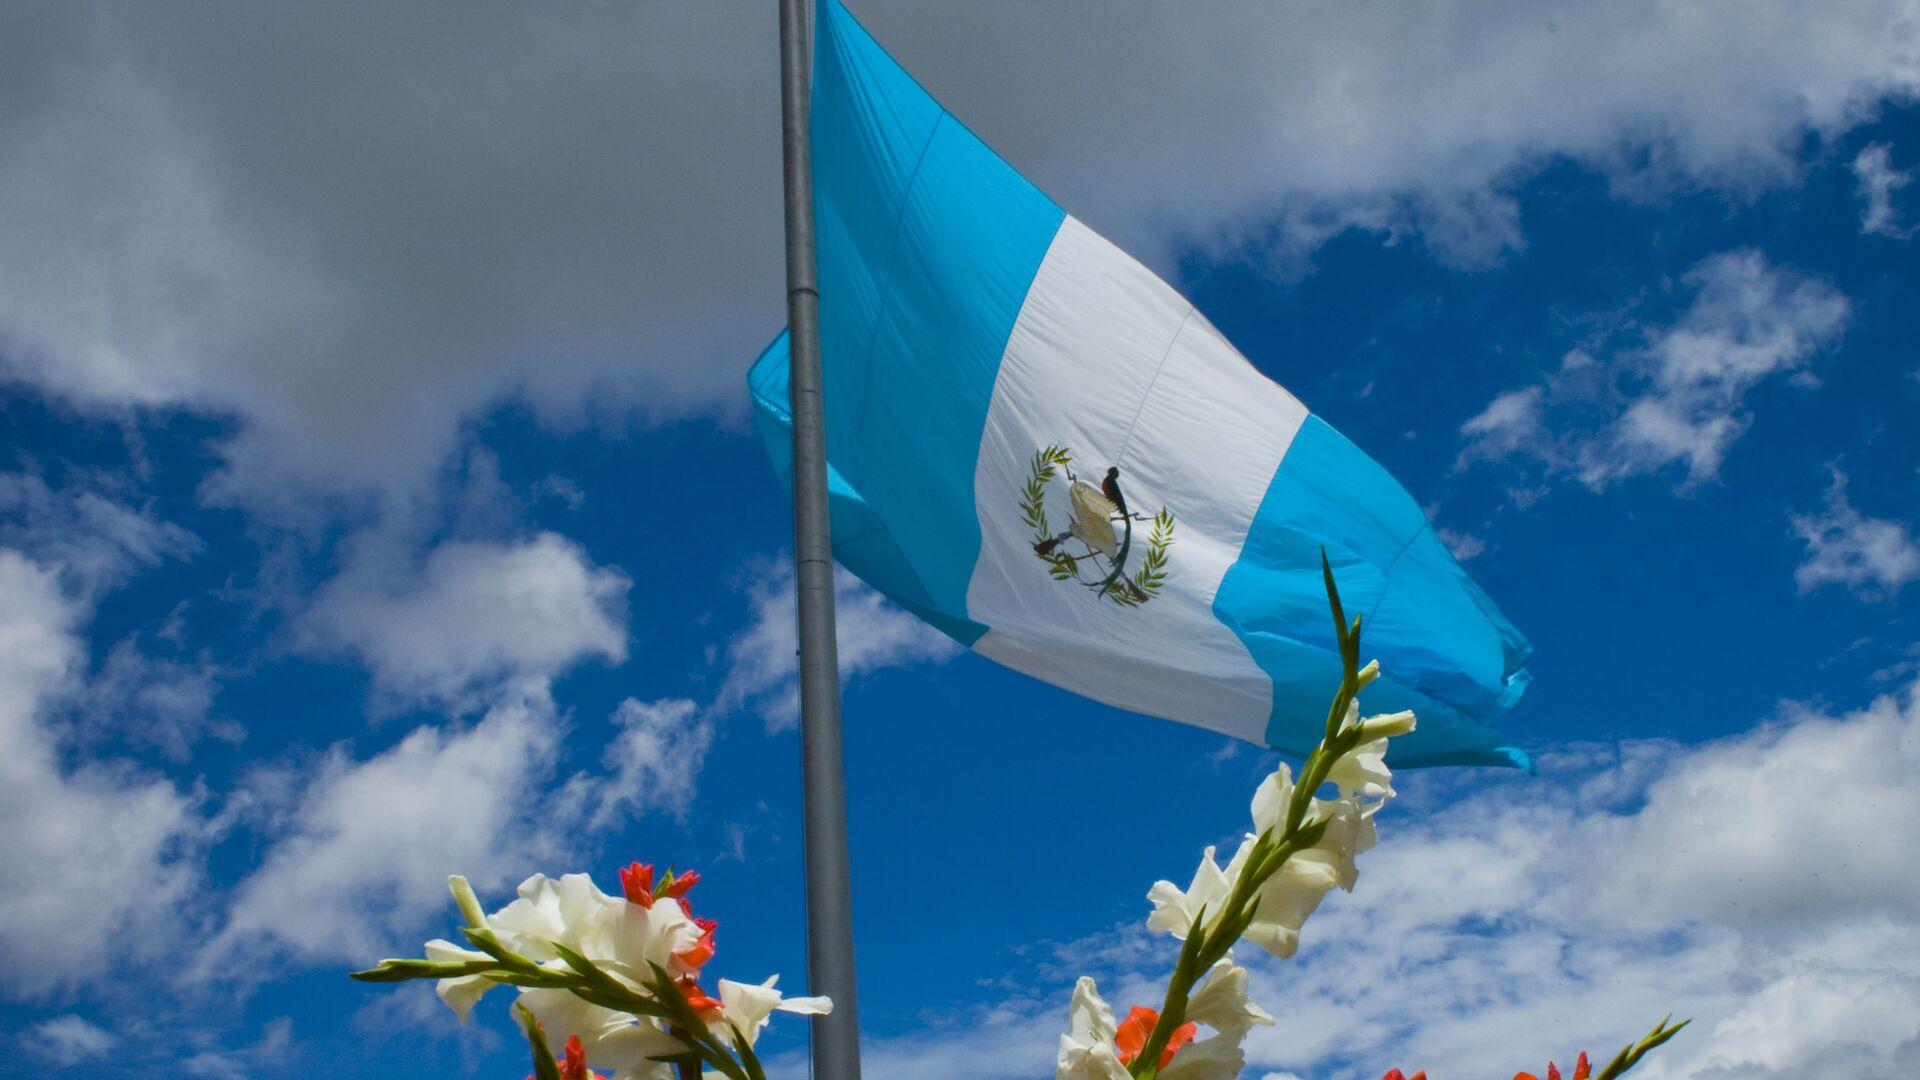 Bandera de Guatemala  - Sputnik Mundo, 1920, 23.07.2021